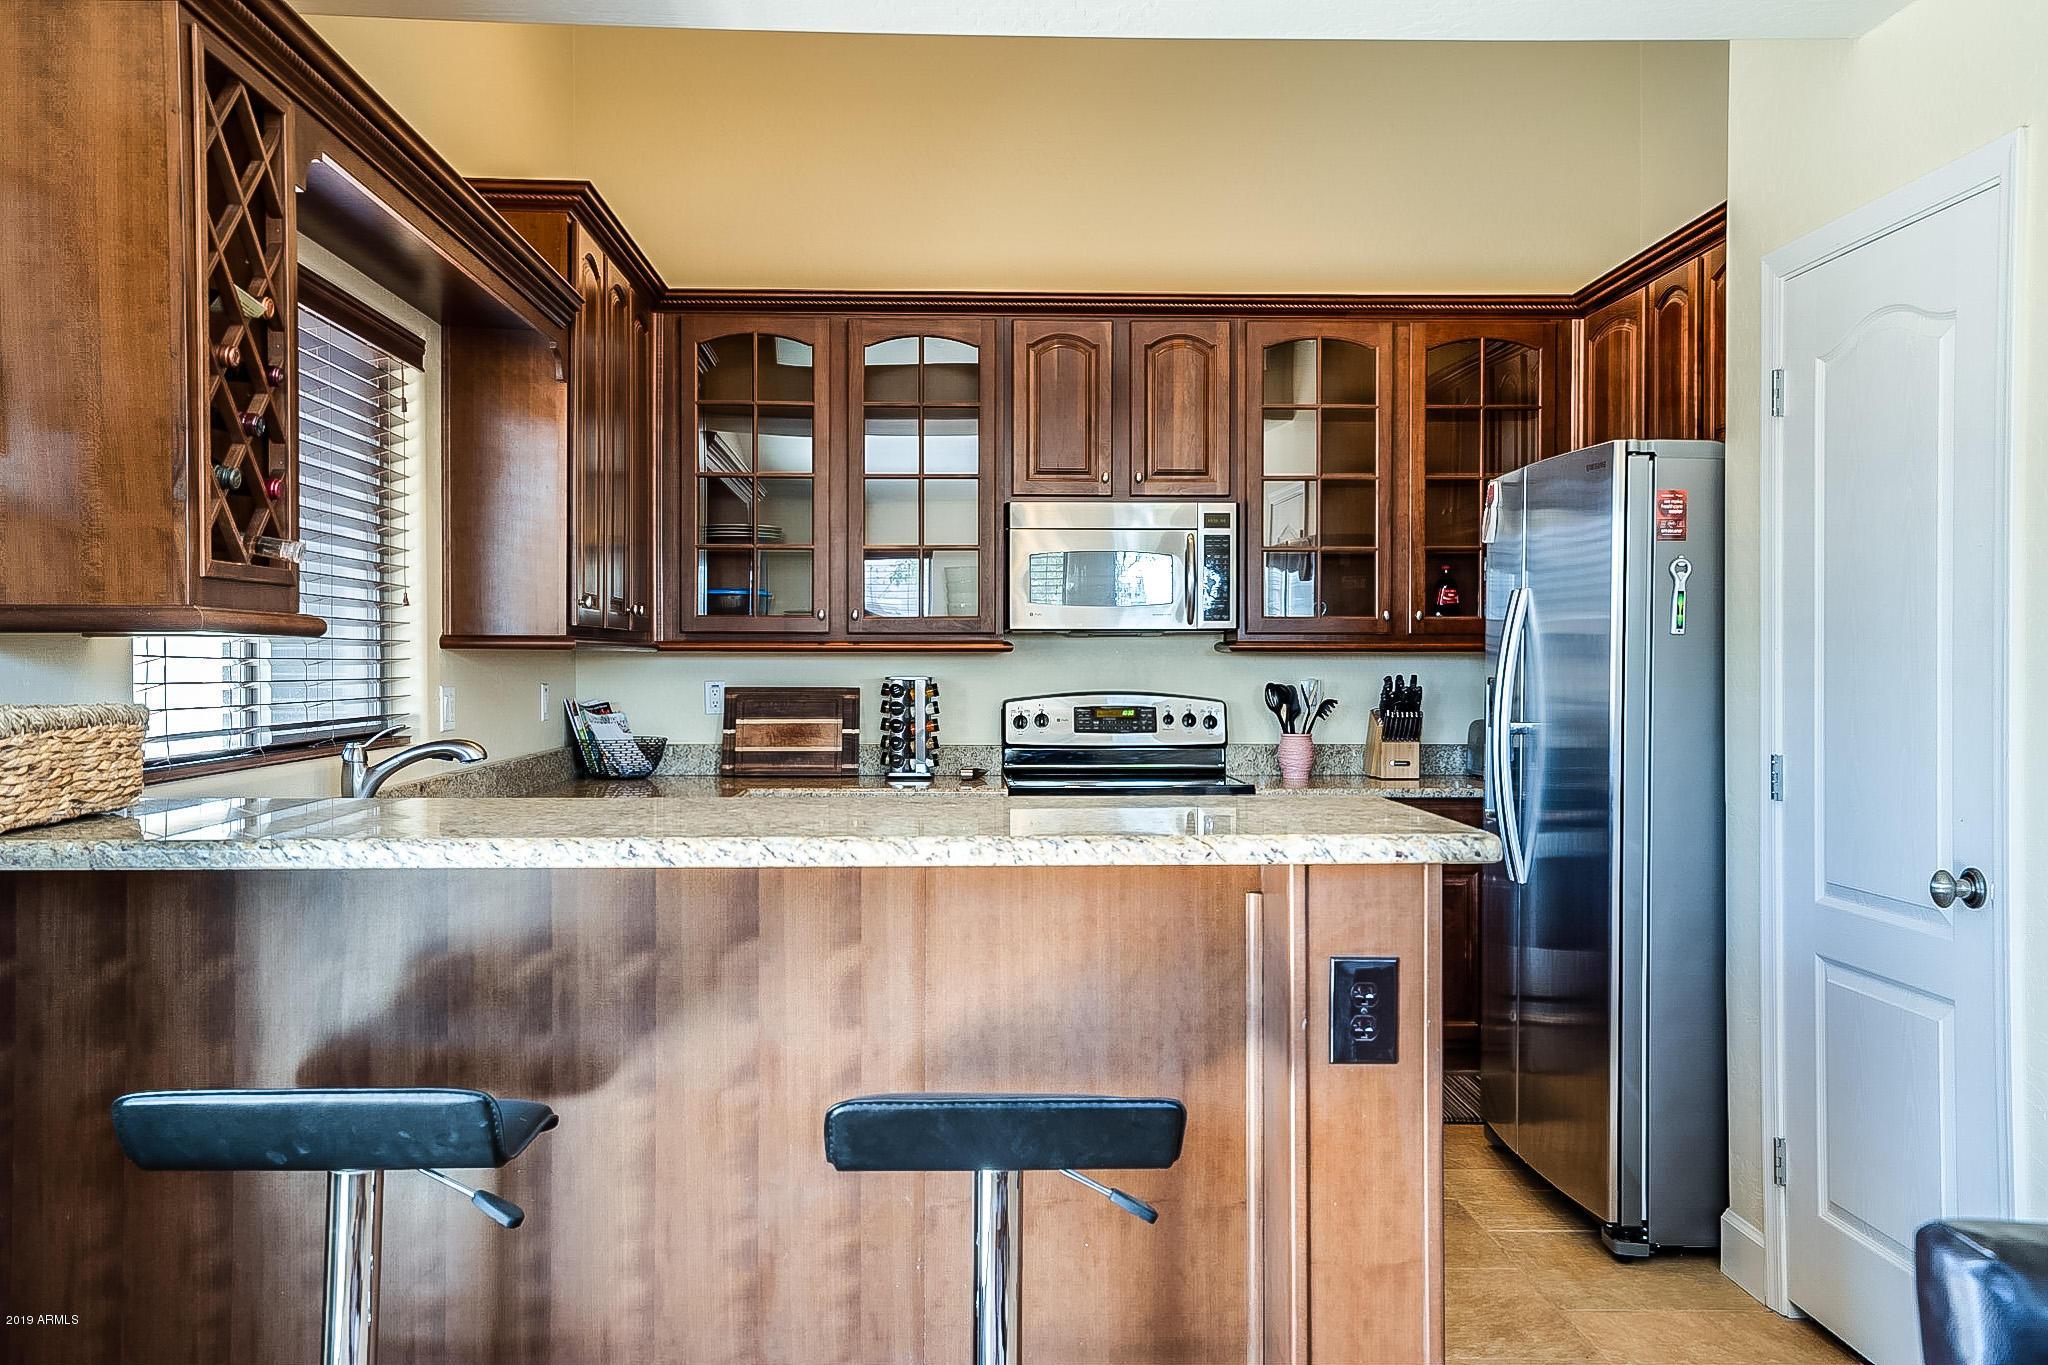 25739 W GIBSON Lane, Buckeye, 85326, MLS # 5934010 | Better Homes and  Gardens BloomTree Realty